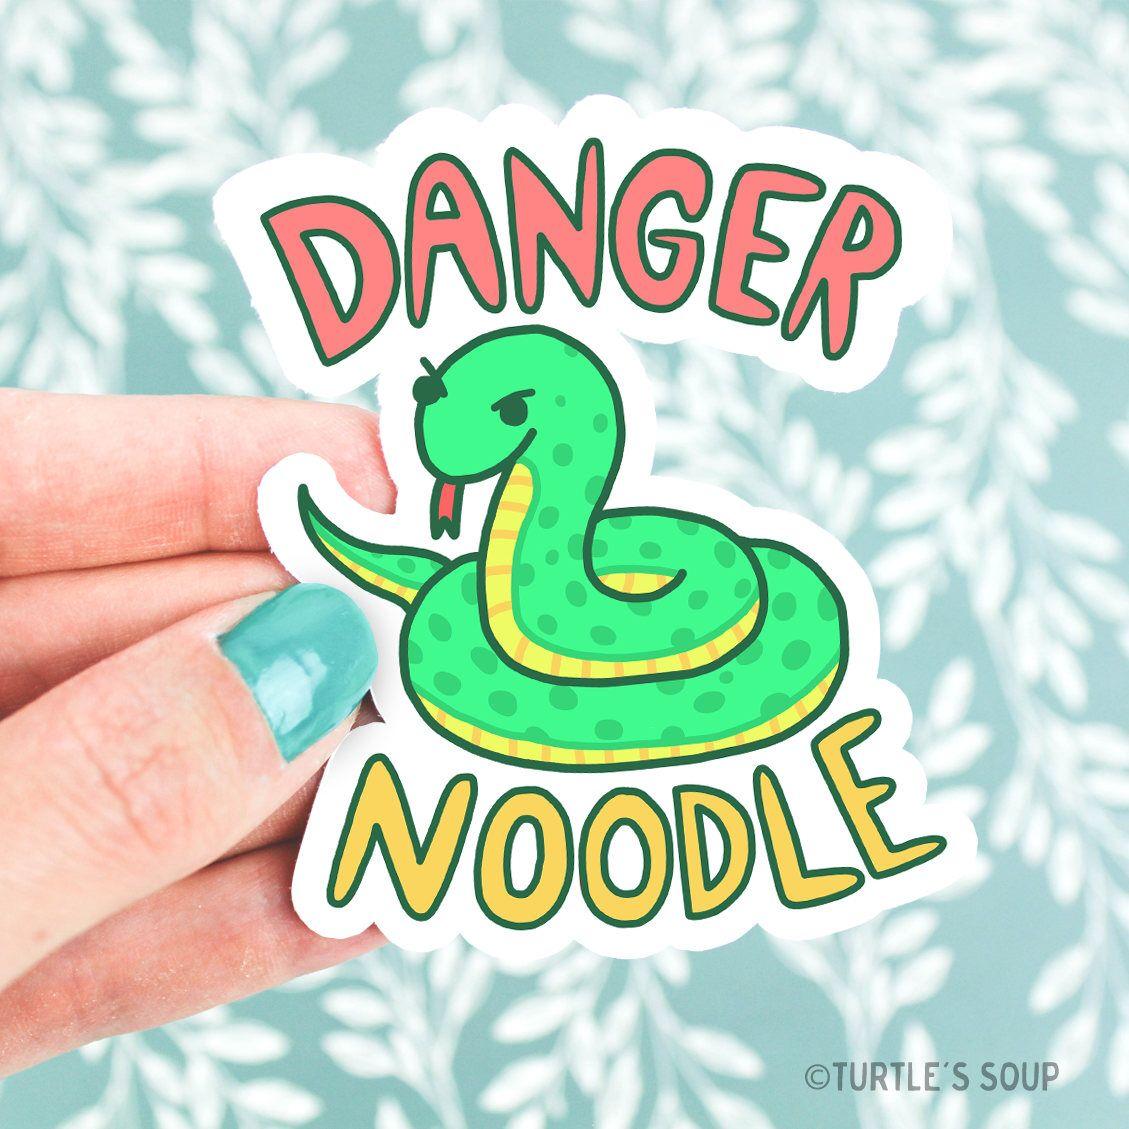 Serpent Art Snake Vinyl Sticker Danger Noodle Funny Pun Cute Green Snake Snake Decal Snake Art Snak Cute Stickers Snake Illustration Hydroflask Stickers [ 1129 x 1129 Pixel ]